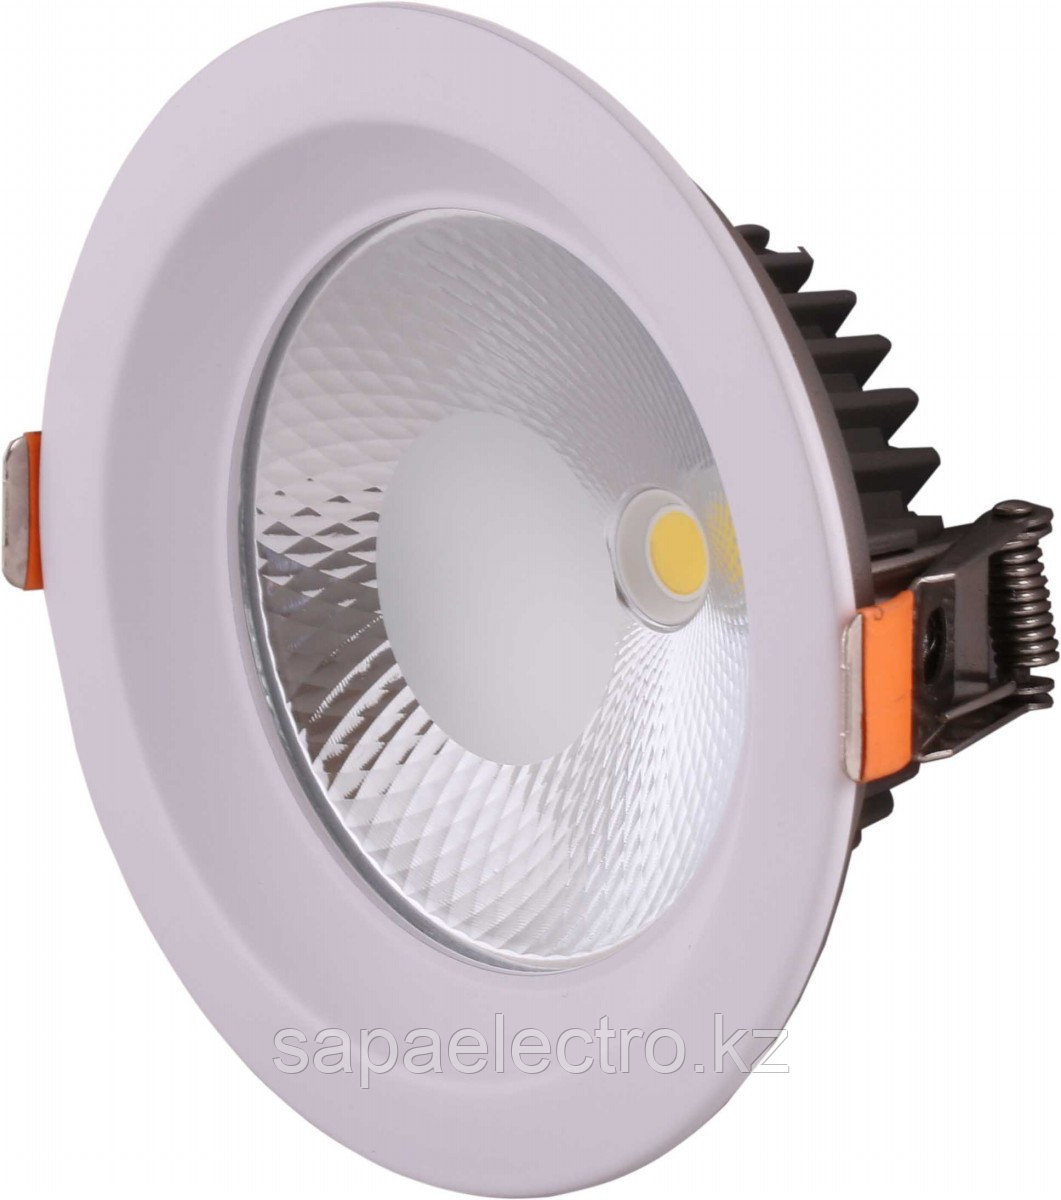 Sv.DOWNLIGHT LED AVENA NEW COB 30W WH 6000K(TT)20